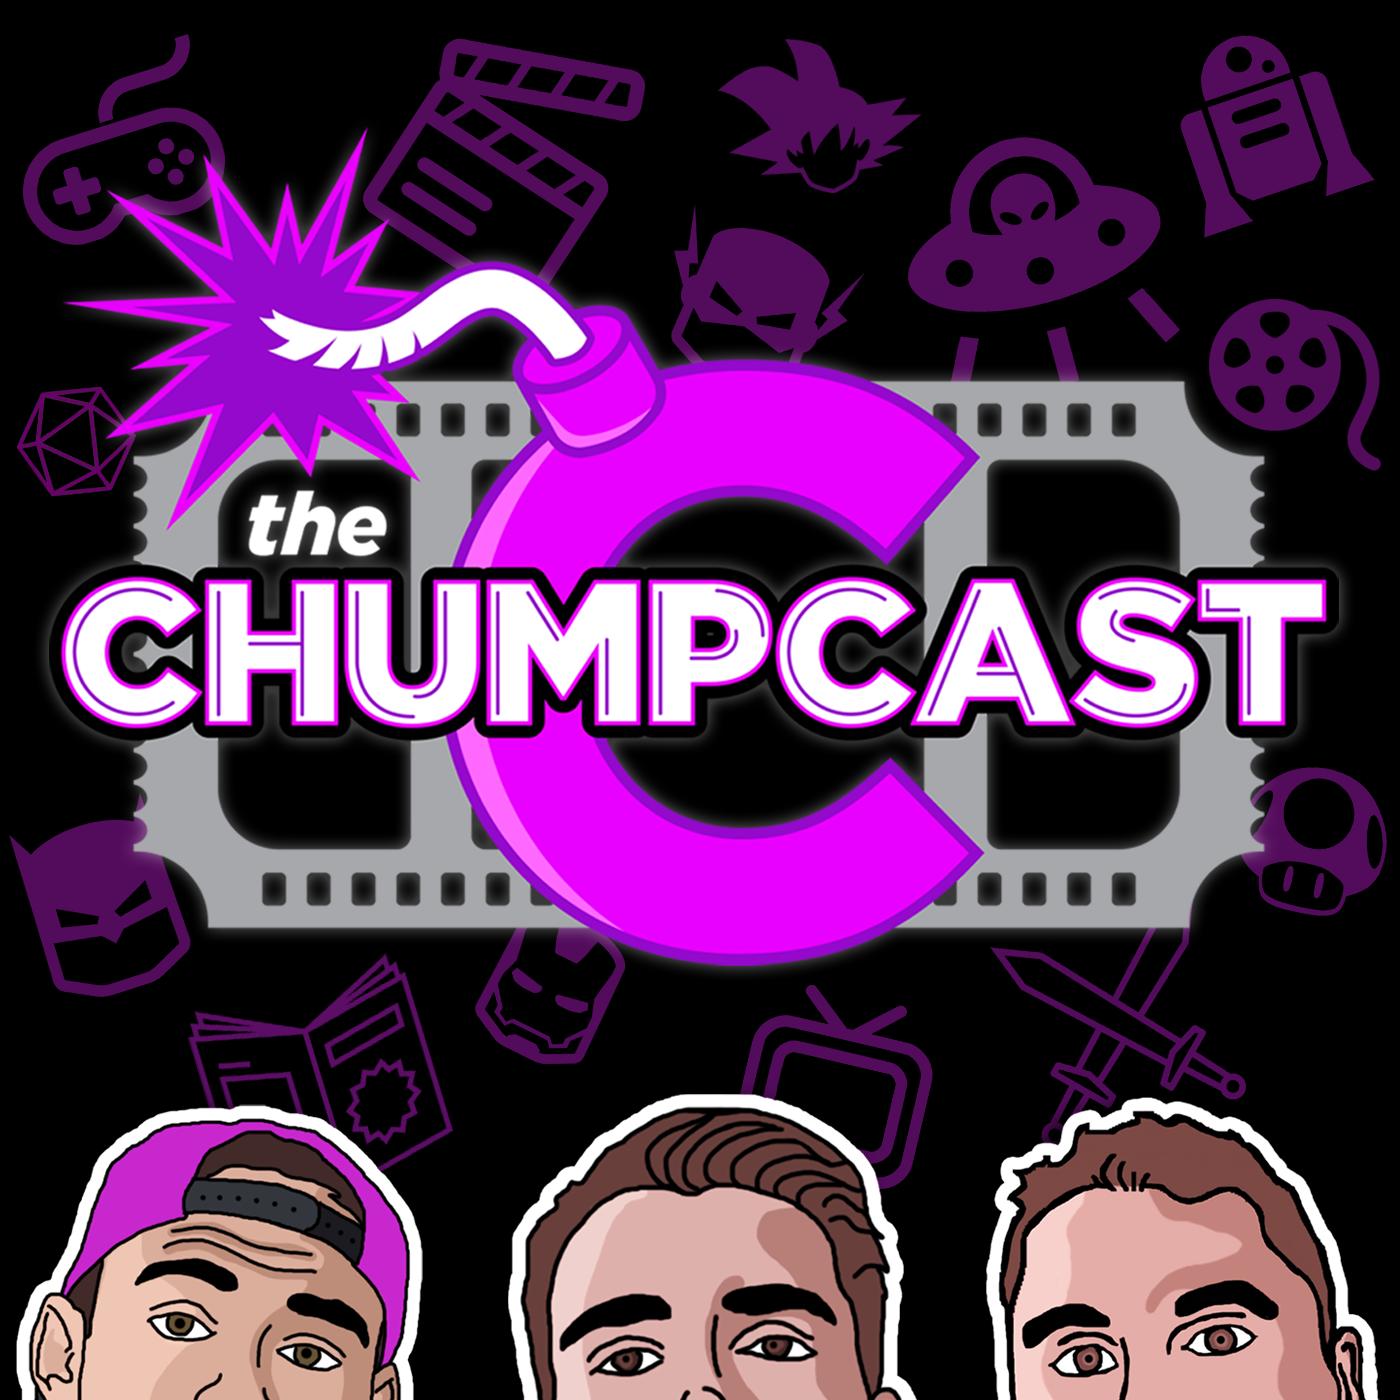 the Chumpcast | Nerd News & Movie Reviews show art